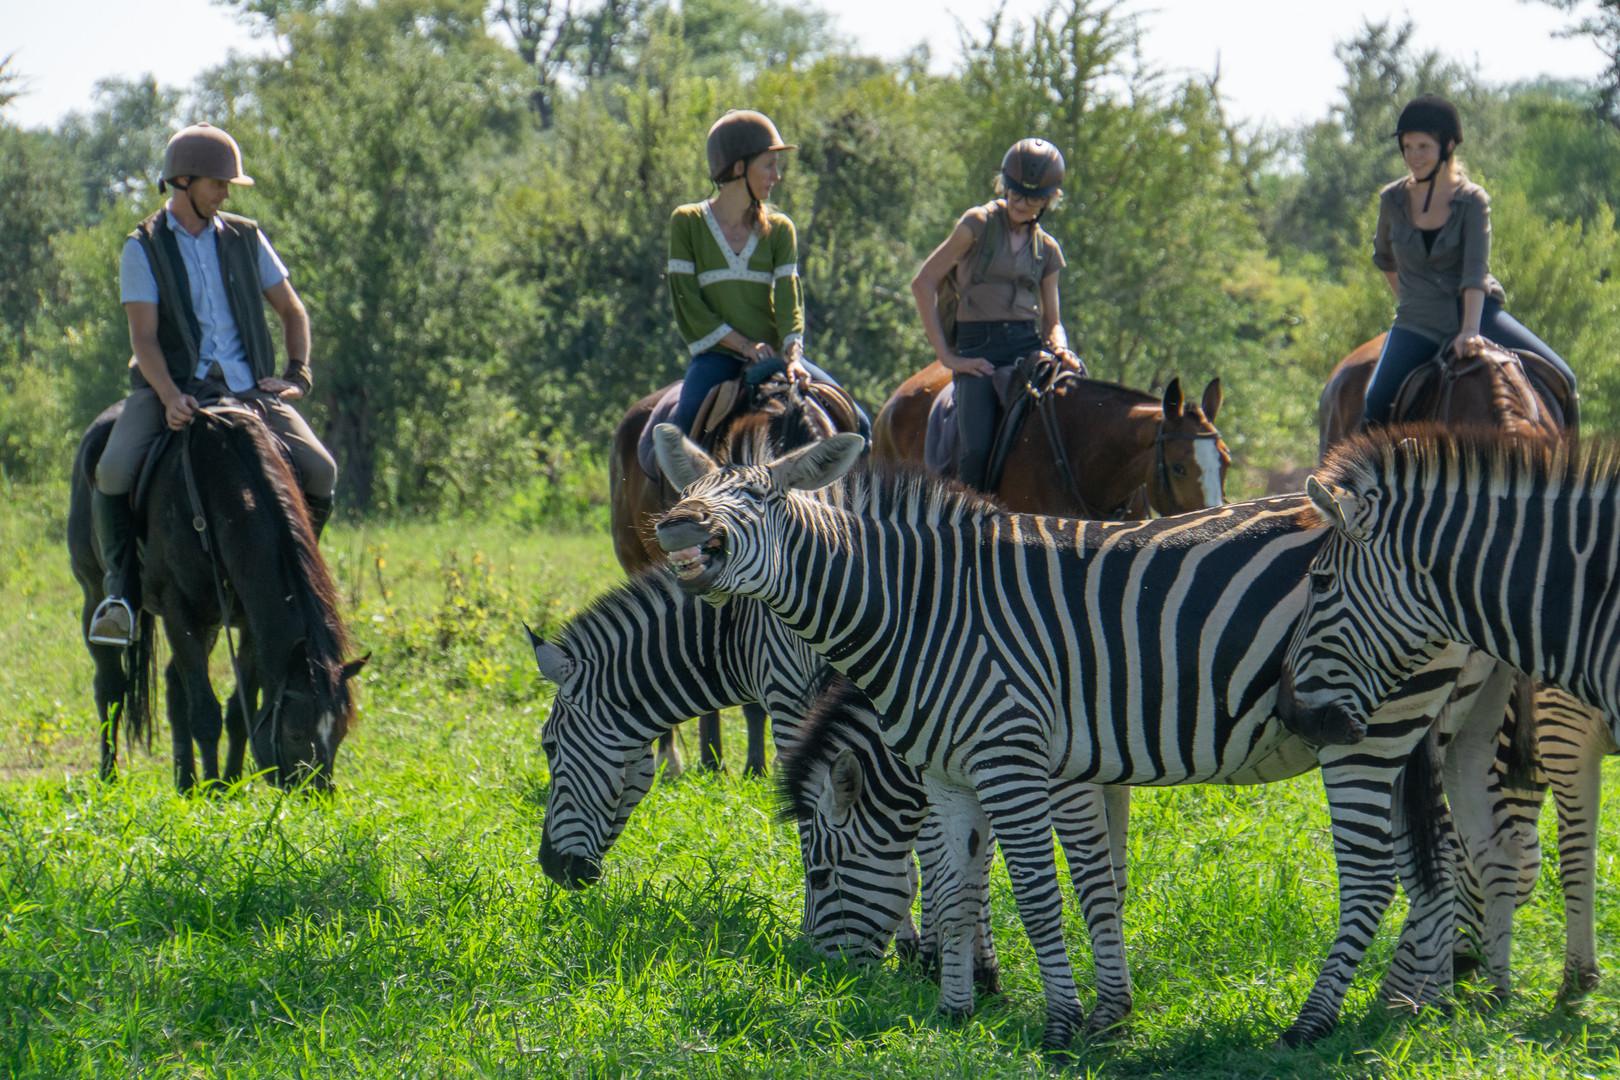 Stanley & Livingstone Horse Ride Safari